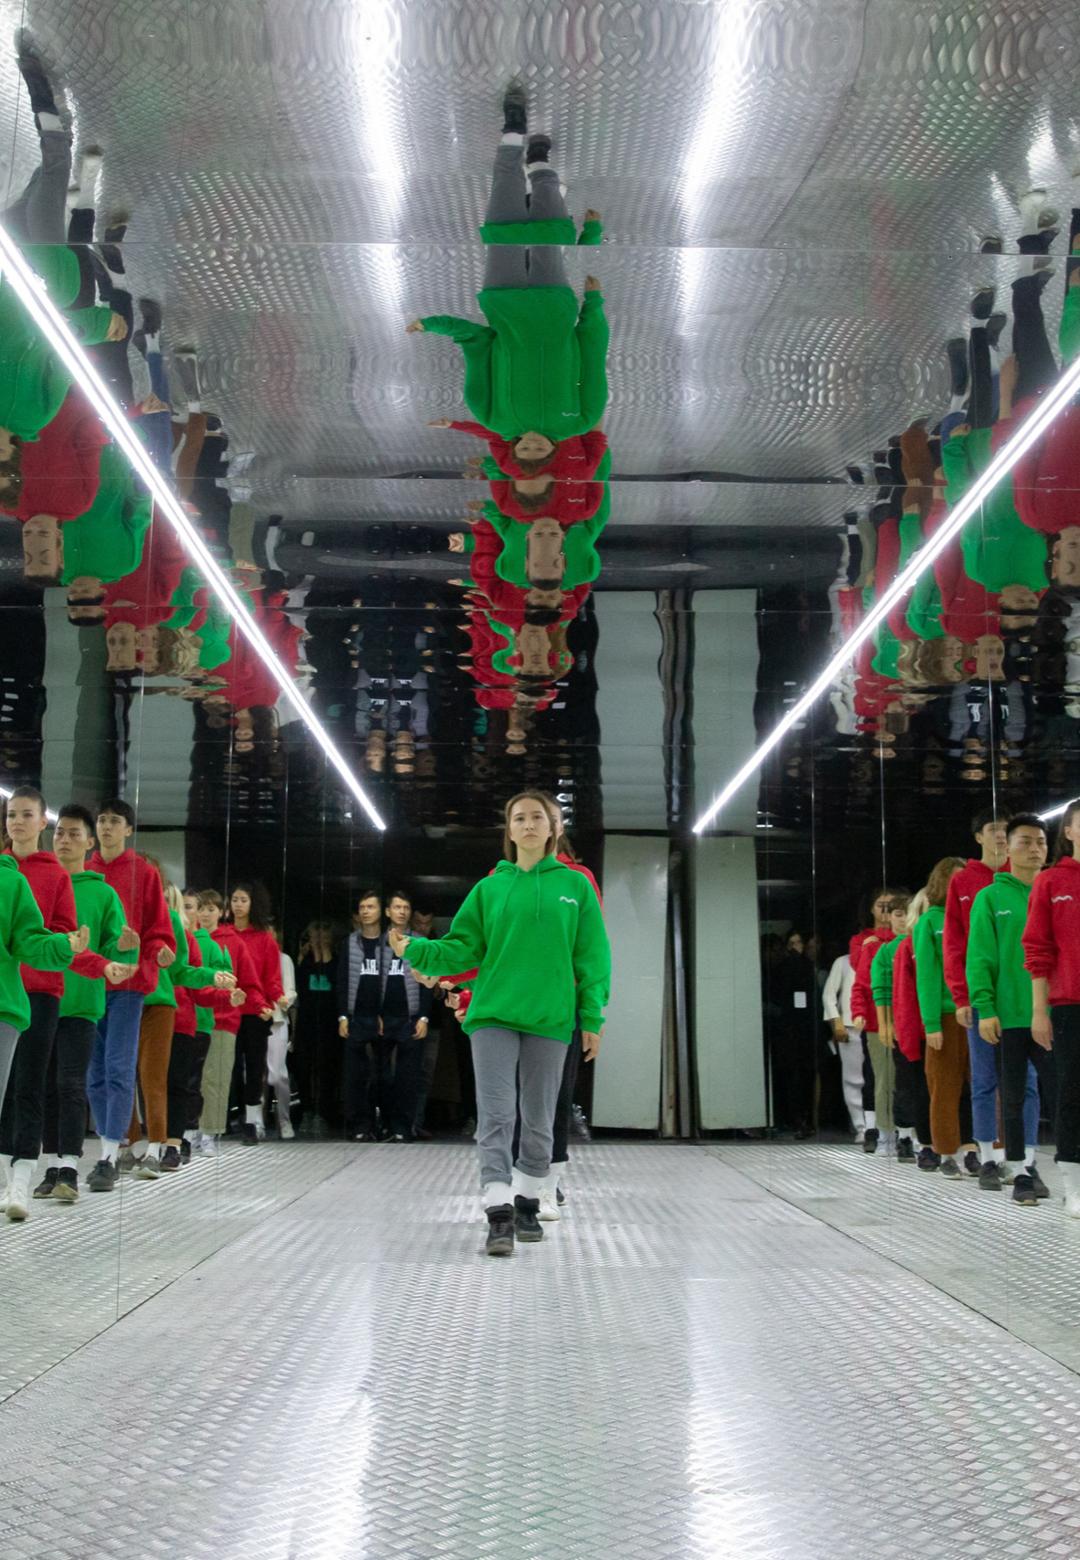 Qinmin Liu. The Rite of Spring, 2019, 120-minute live performance, 5th Ural Industrial Biennial, The Ural Optical and Mechanical Plant | 5th Ural Industrial Biennial | STIRworld